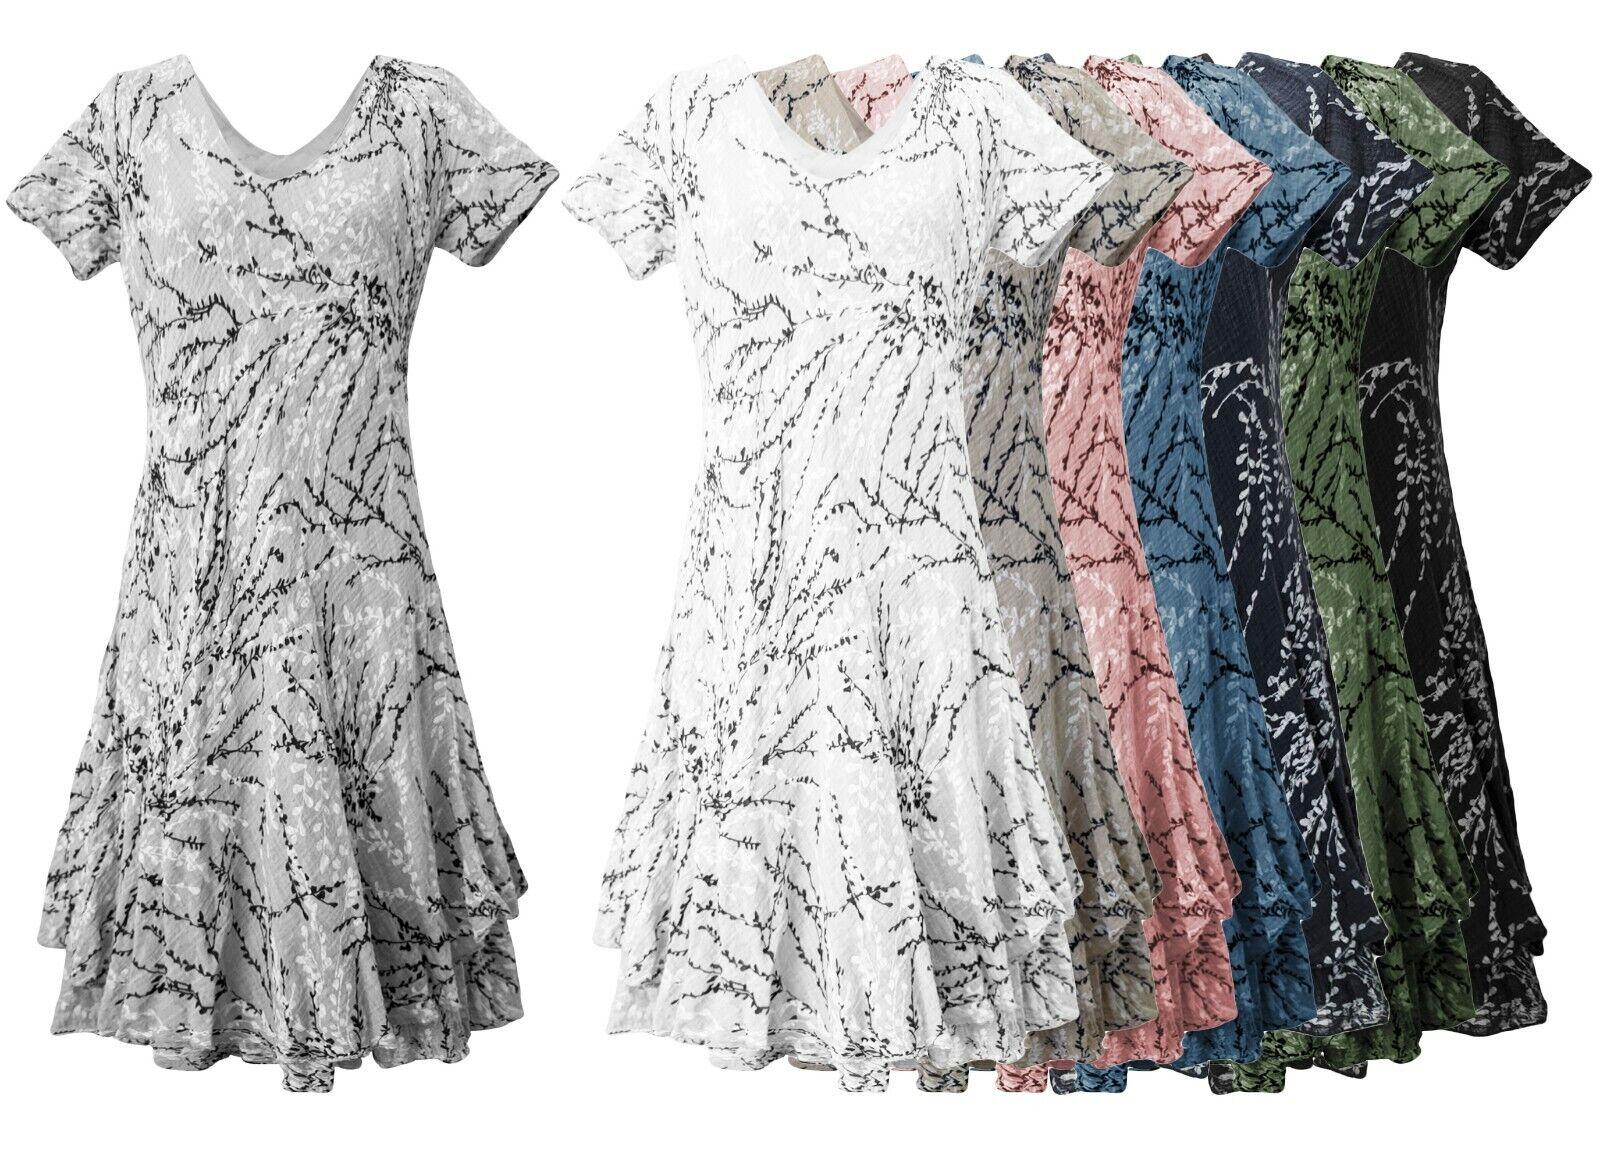 Sommerkleid Baumwolle / Viskose A-Linie klassisches Damenkleid Trägerkleid 36-40